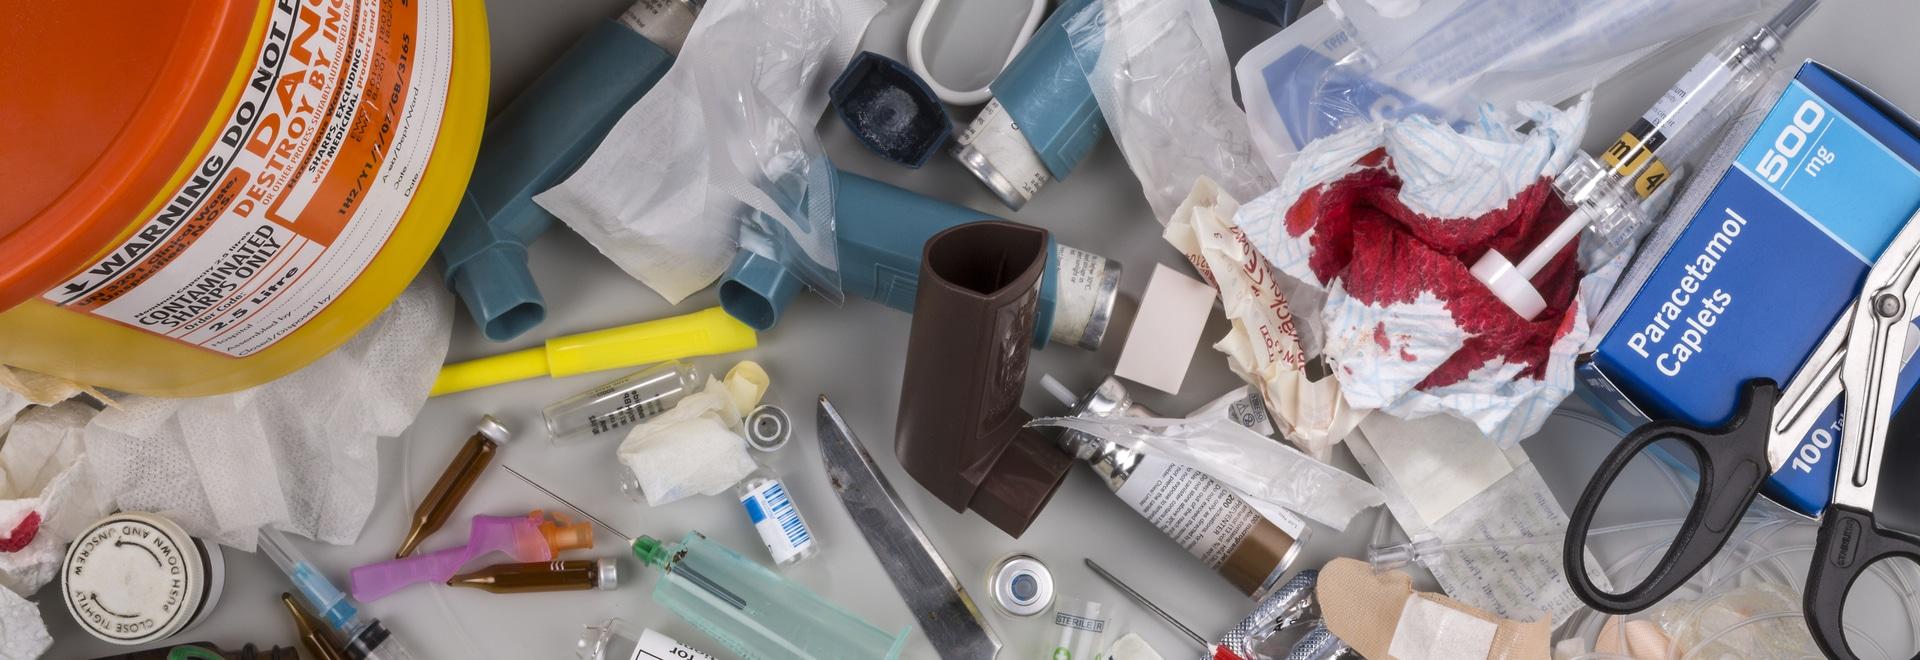 basura médica